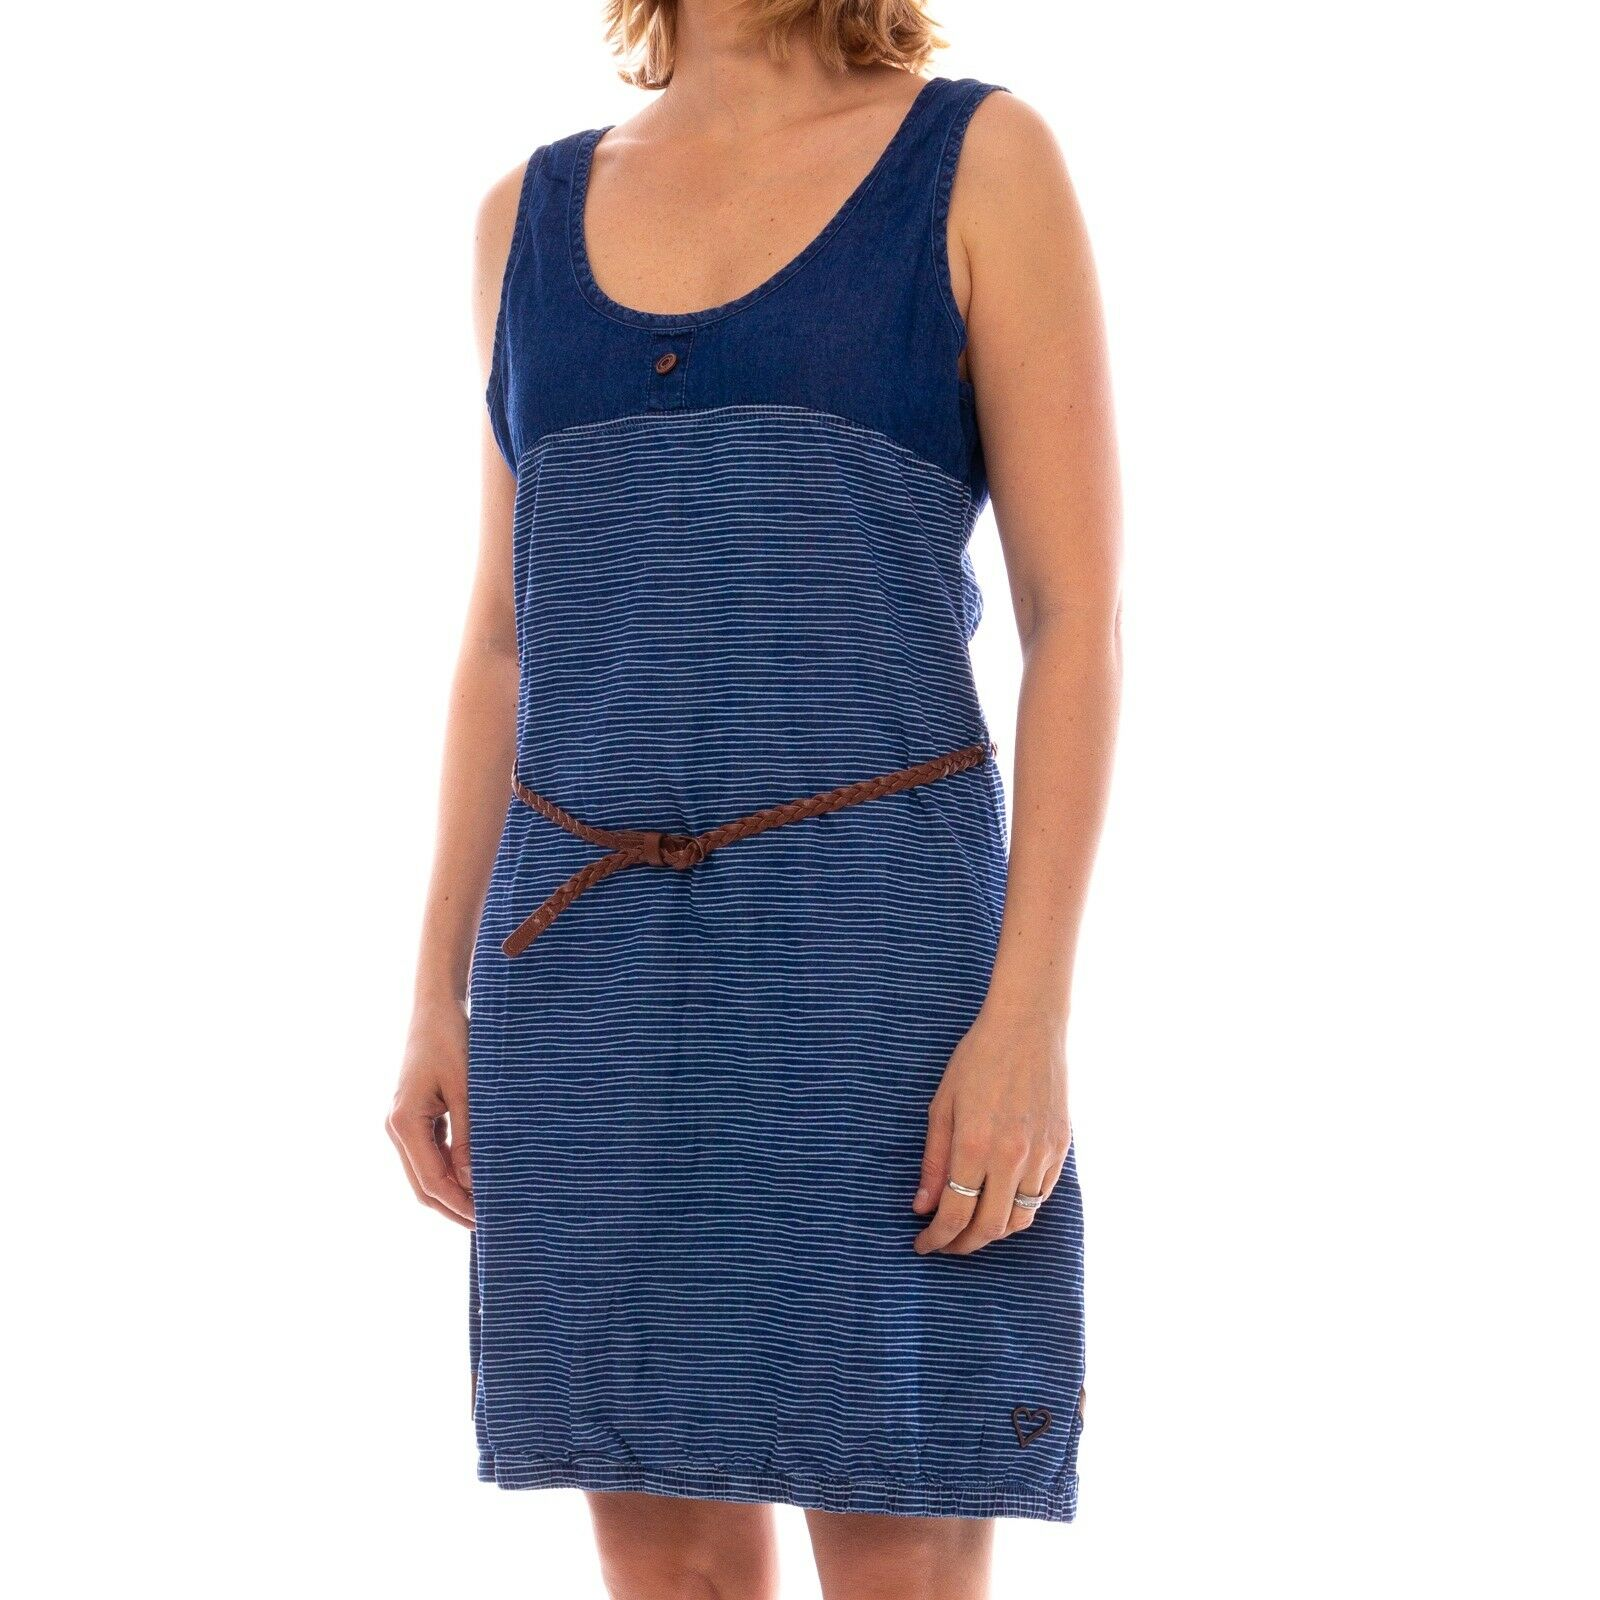 Alife & Kickin DOJA D Dress Kleid Damen Sommerkleid ddenistrip 35240